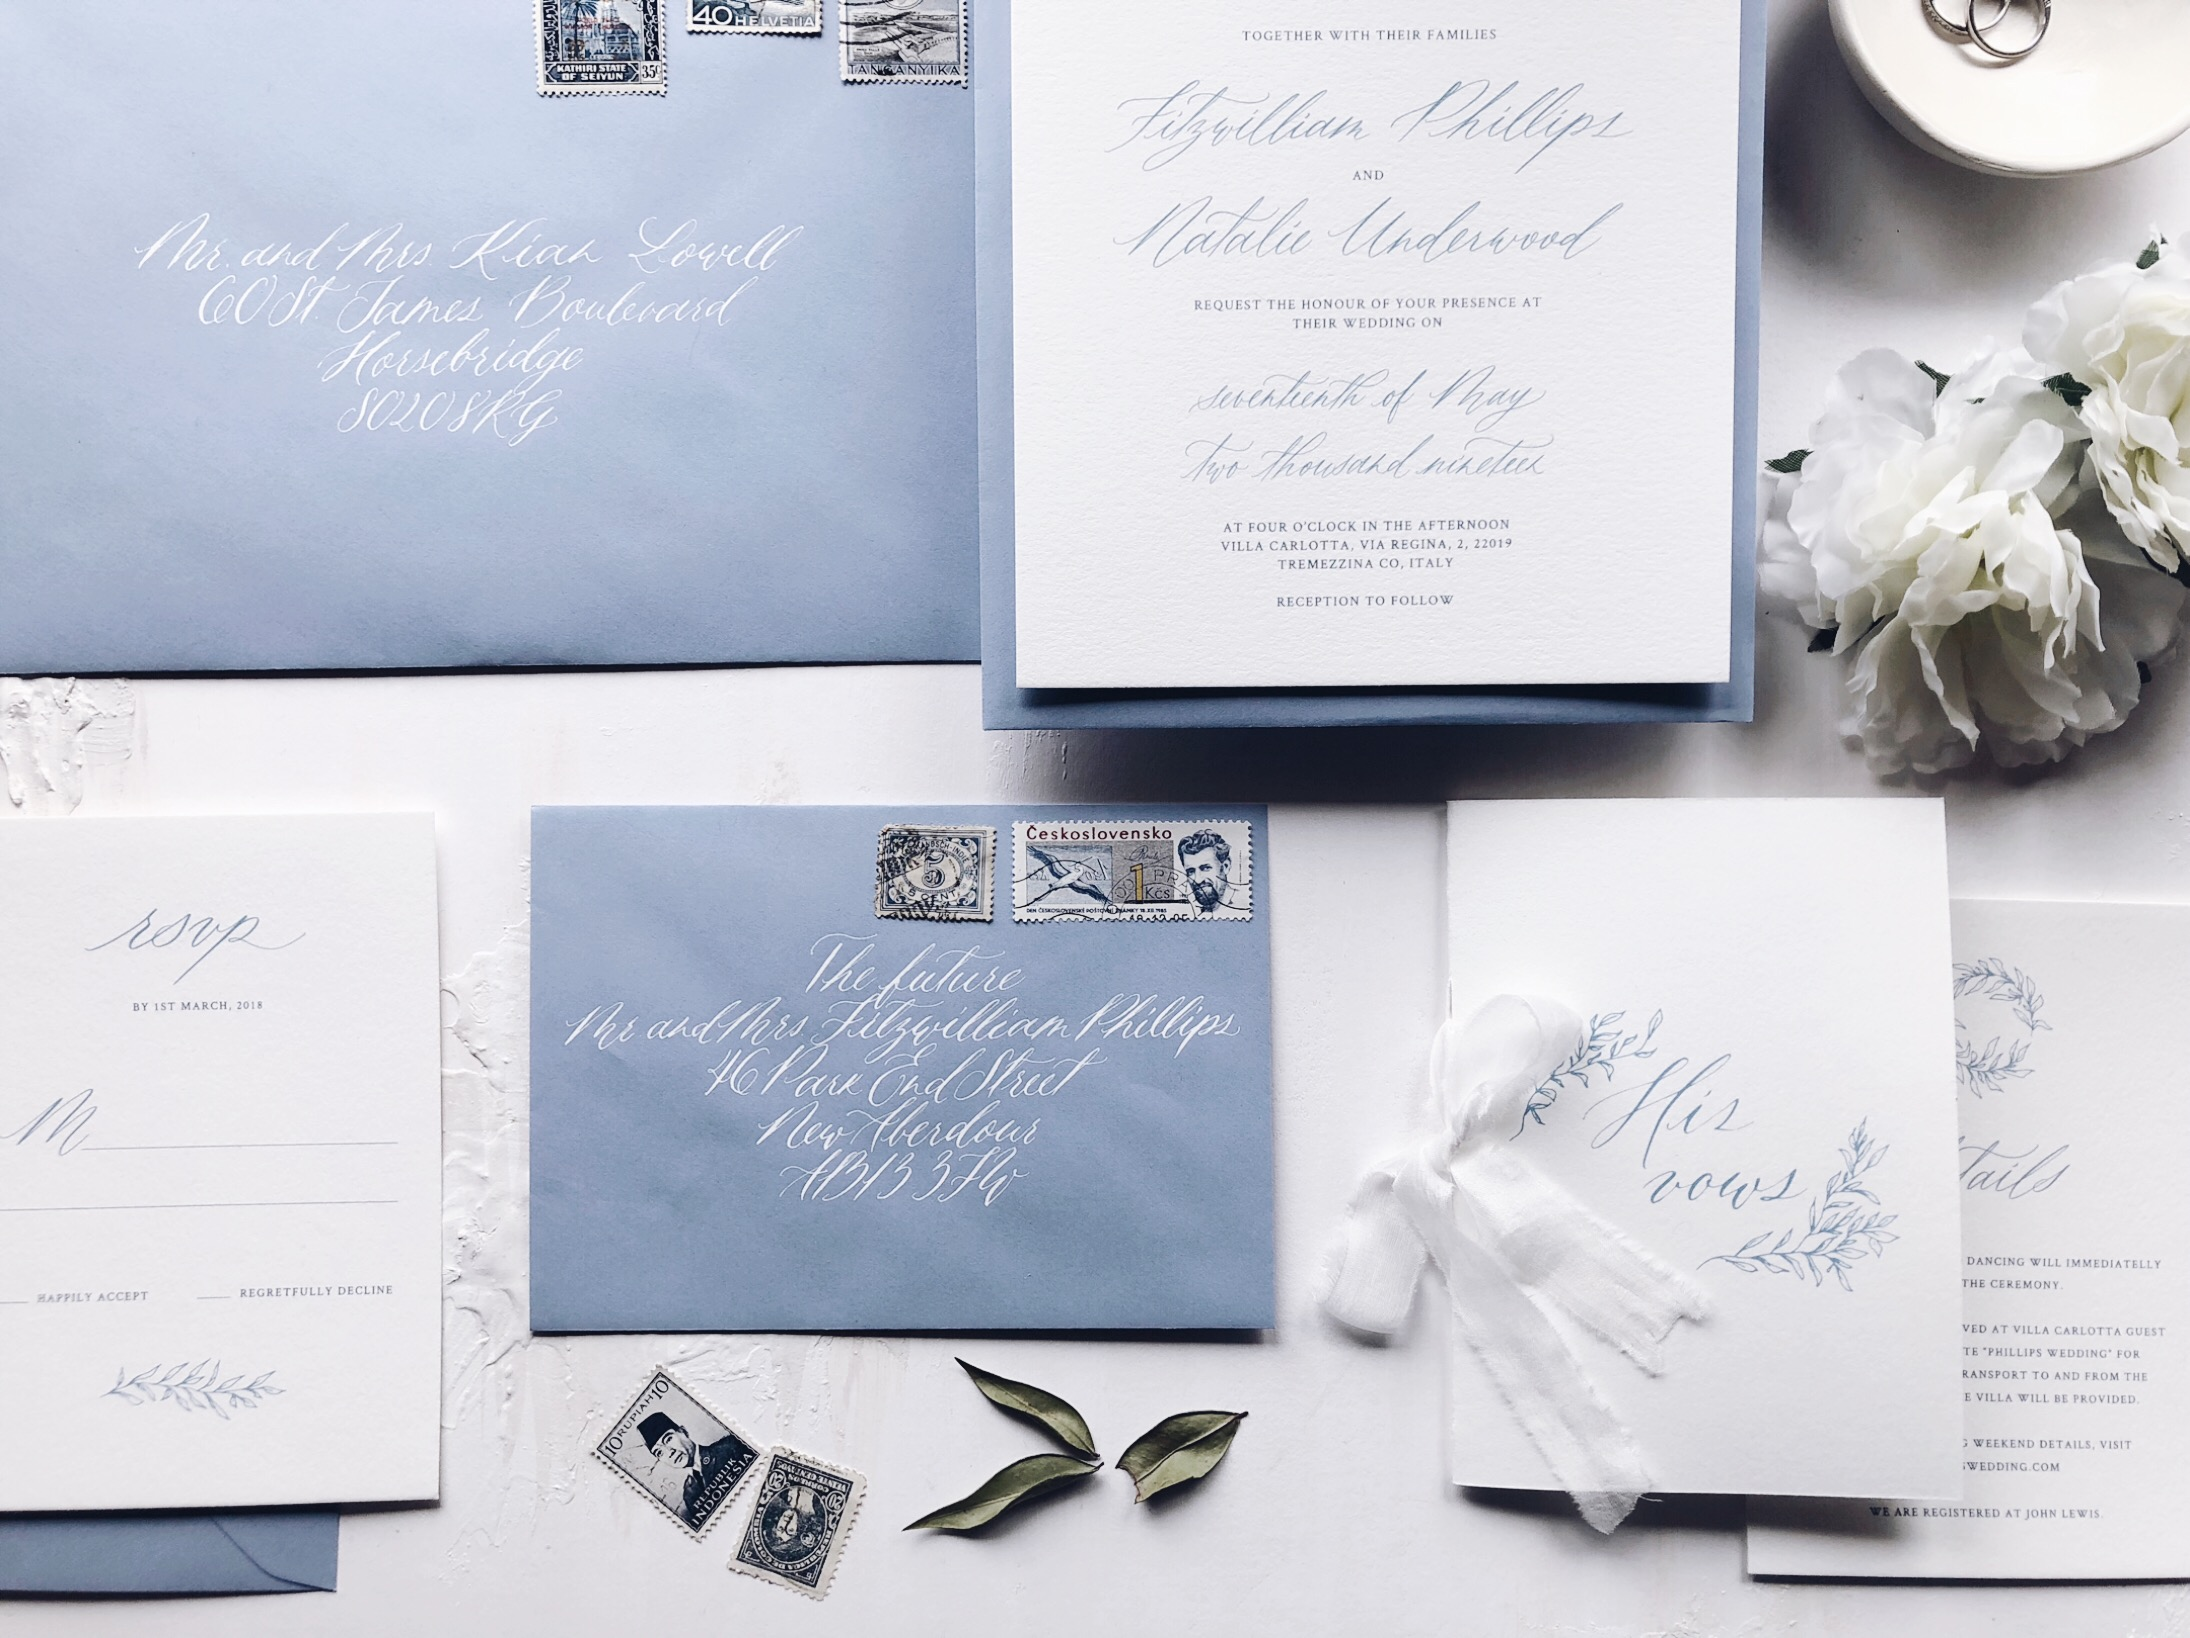 styled_wedding_invitations.JPG